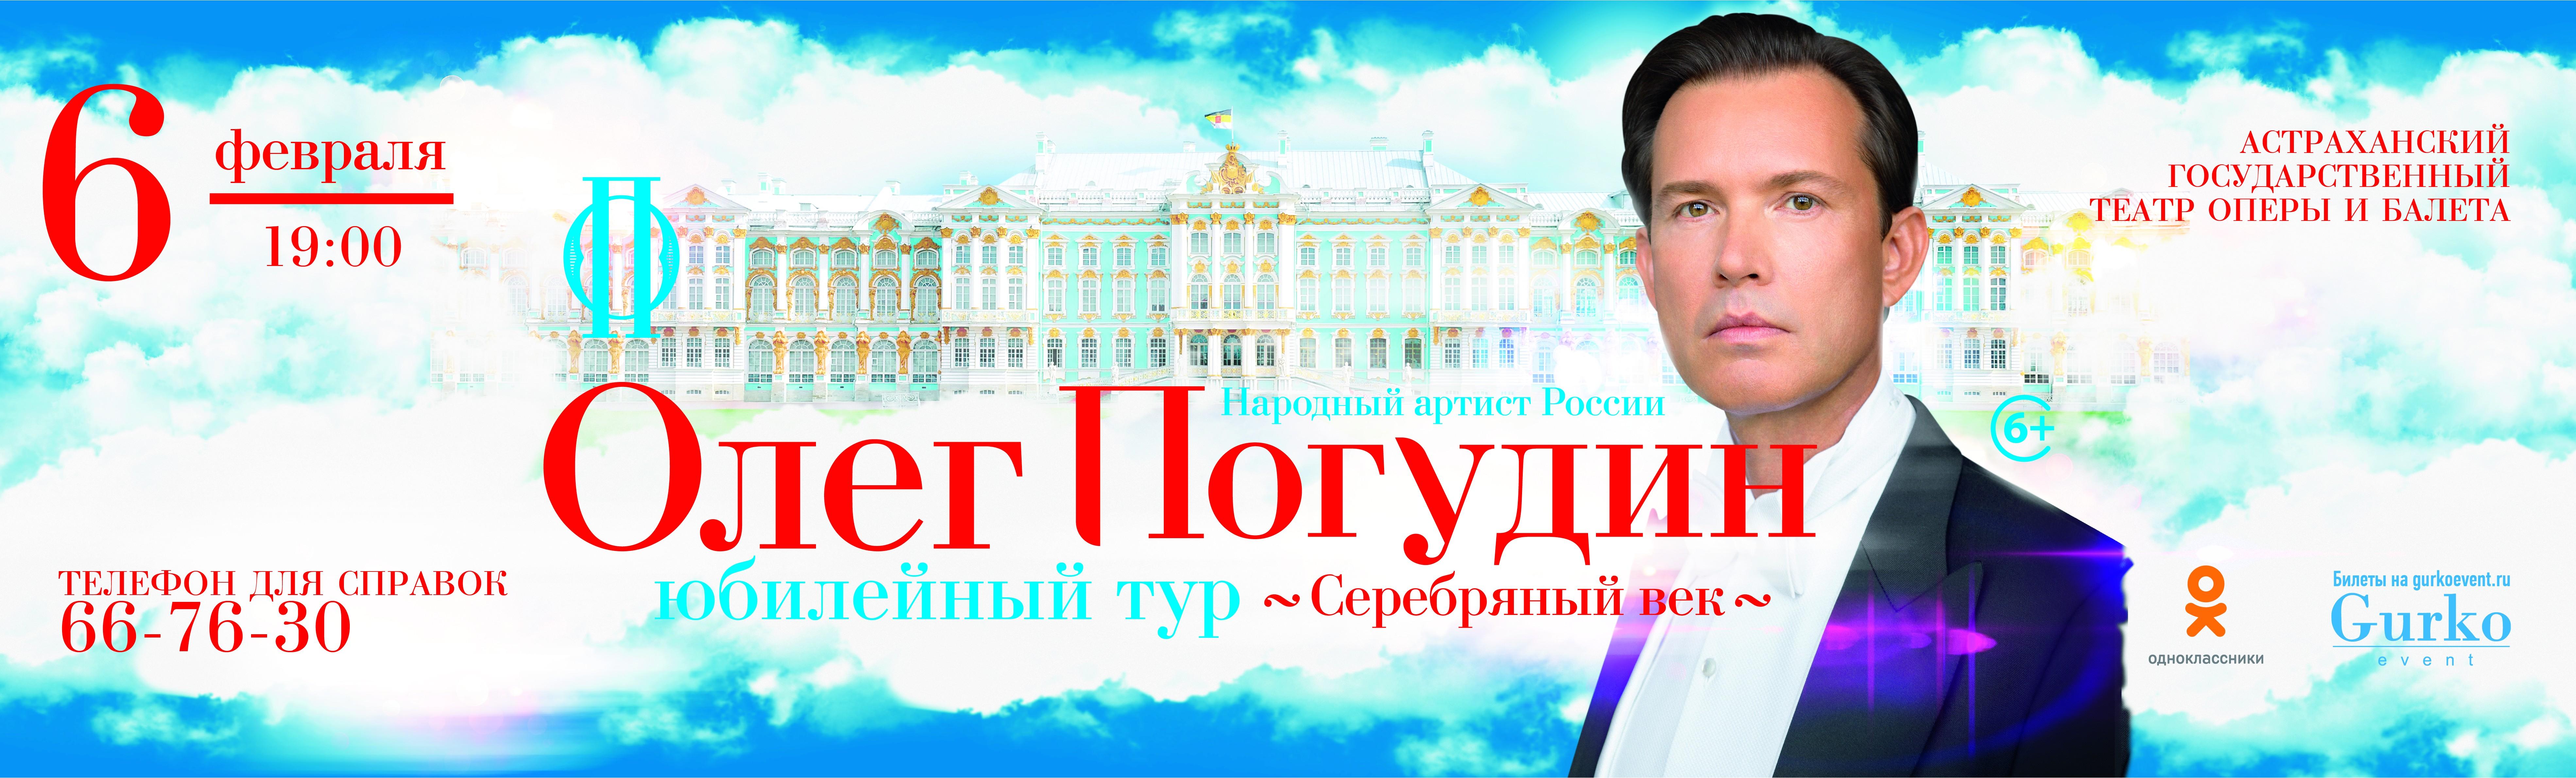 Олег Погудин. 50. Юбилейный концерт.